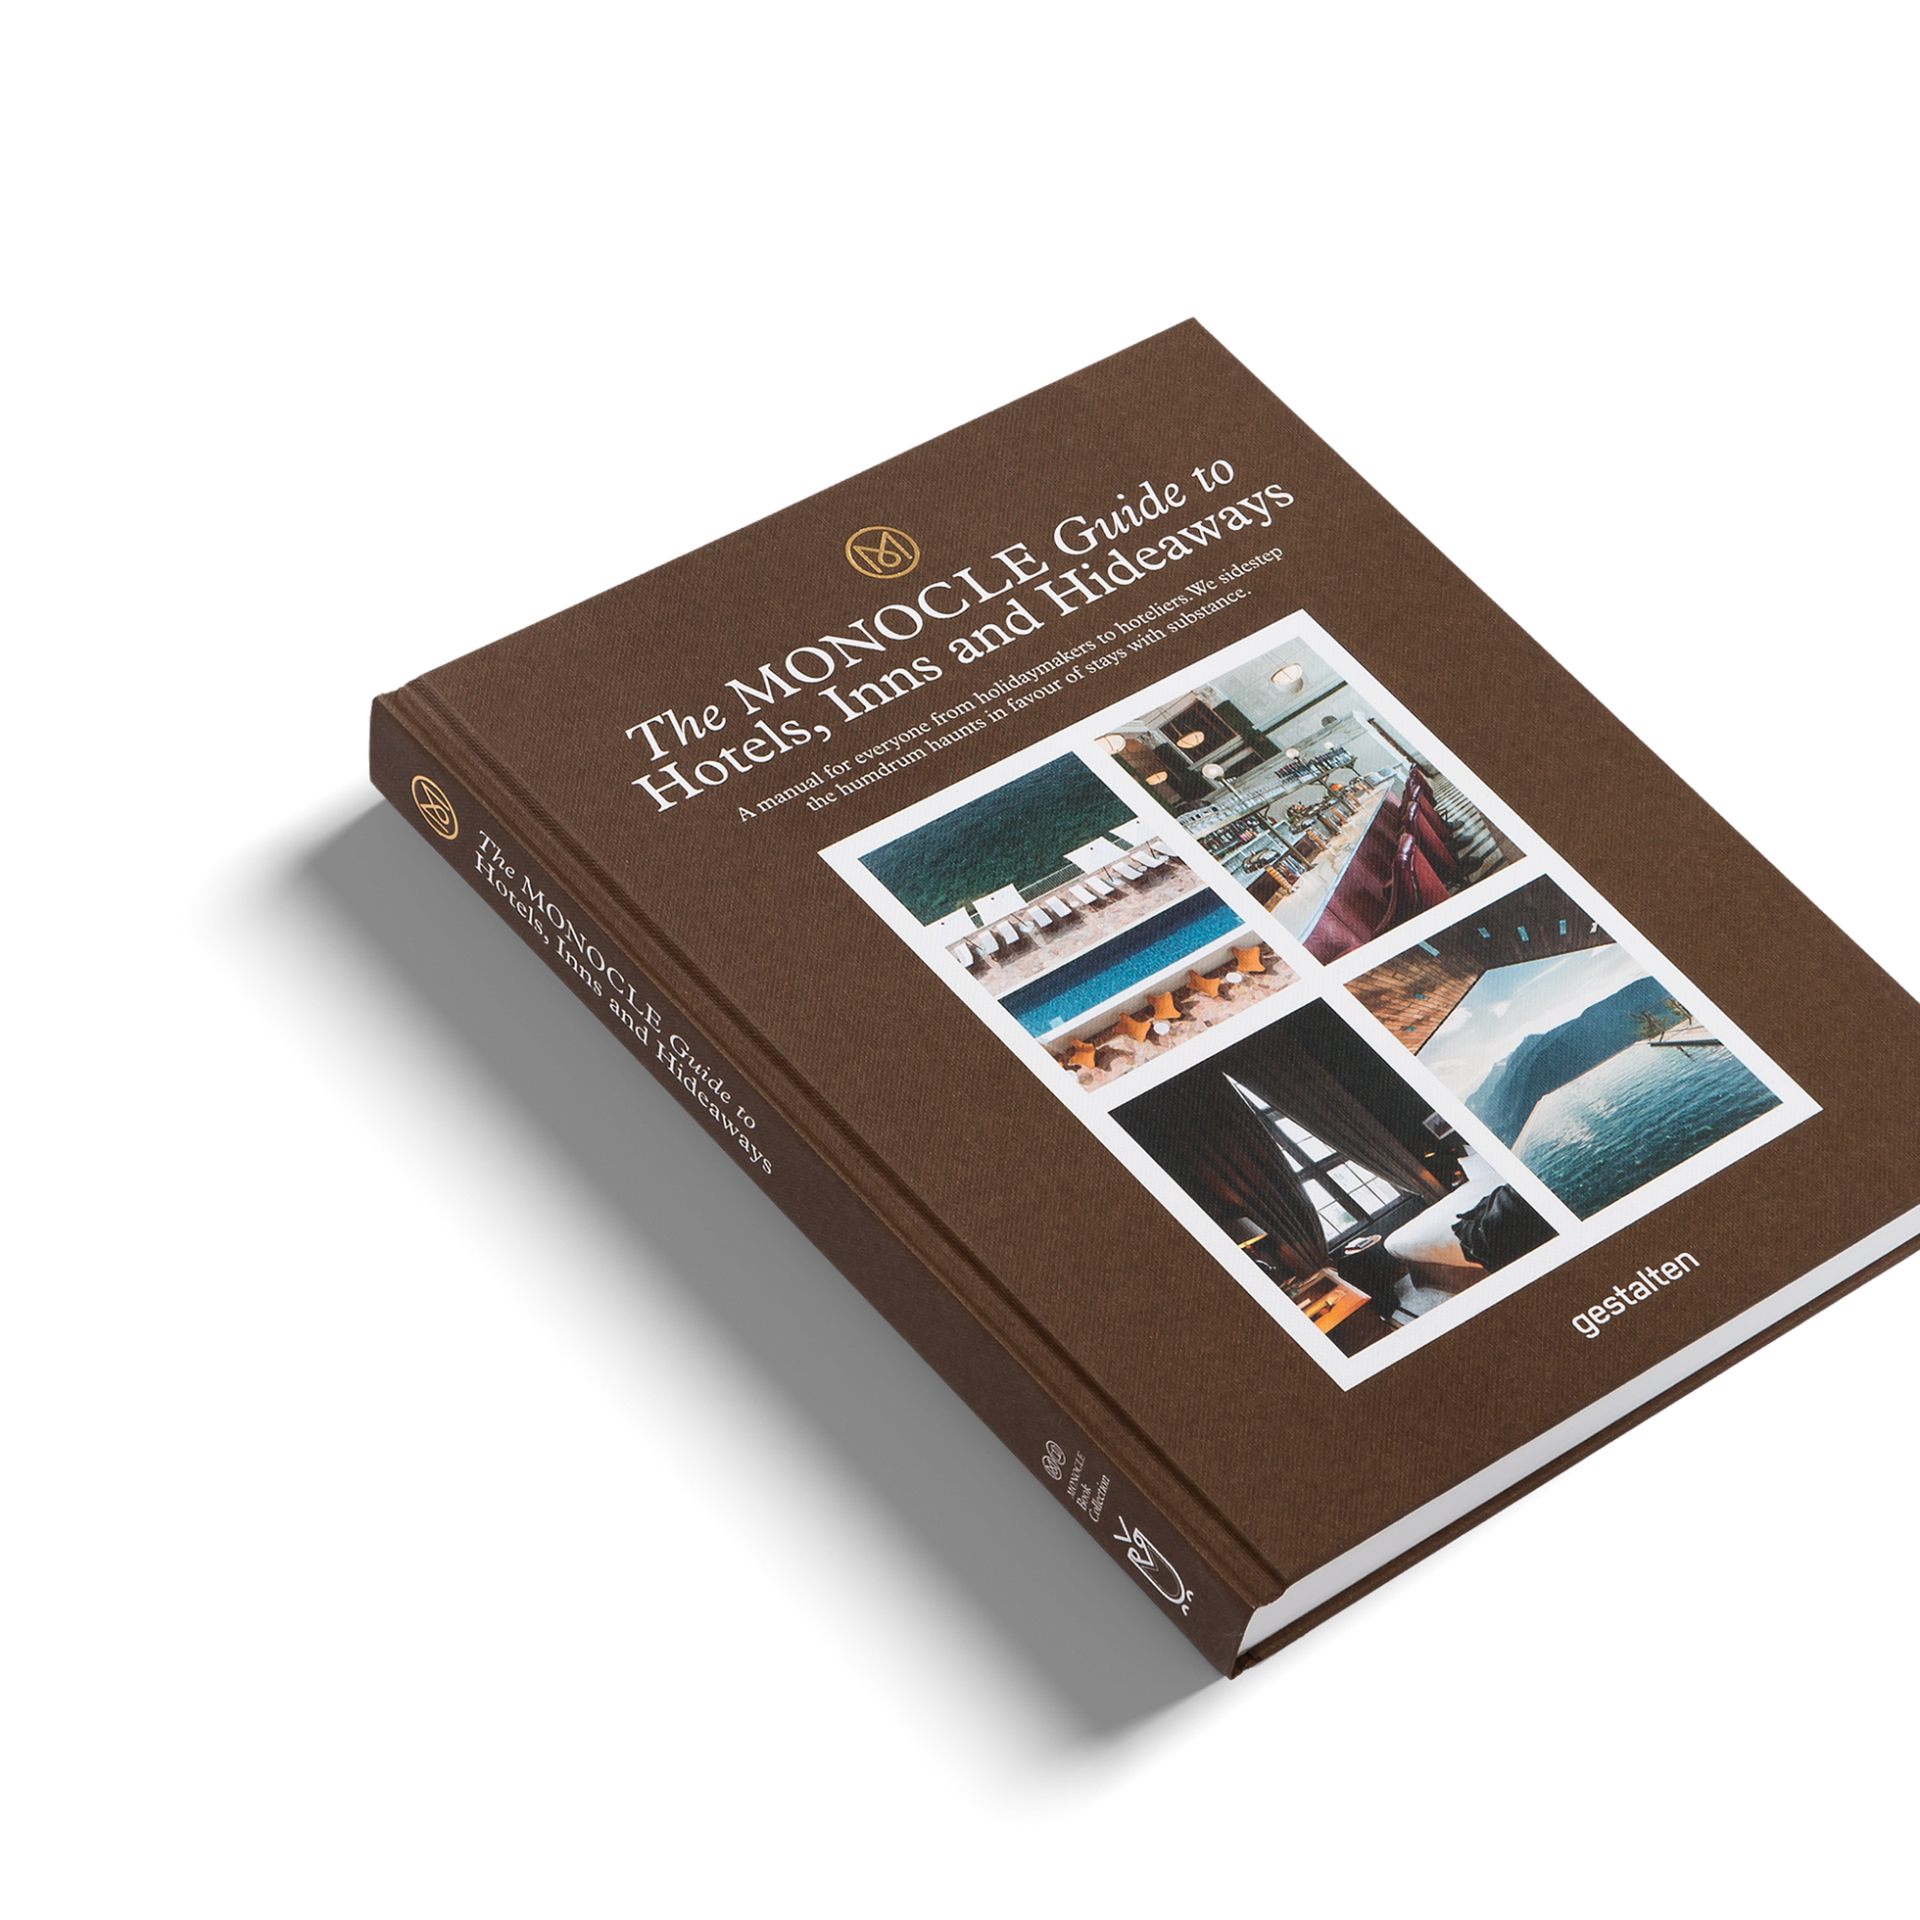 Denisa Strmiskova Studio | spatial design MONOCLE GUIDE TO HOTELS, INNS AND HIDEAWAYS